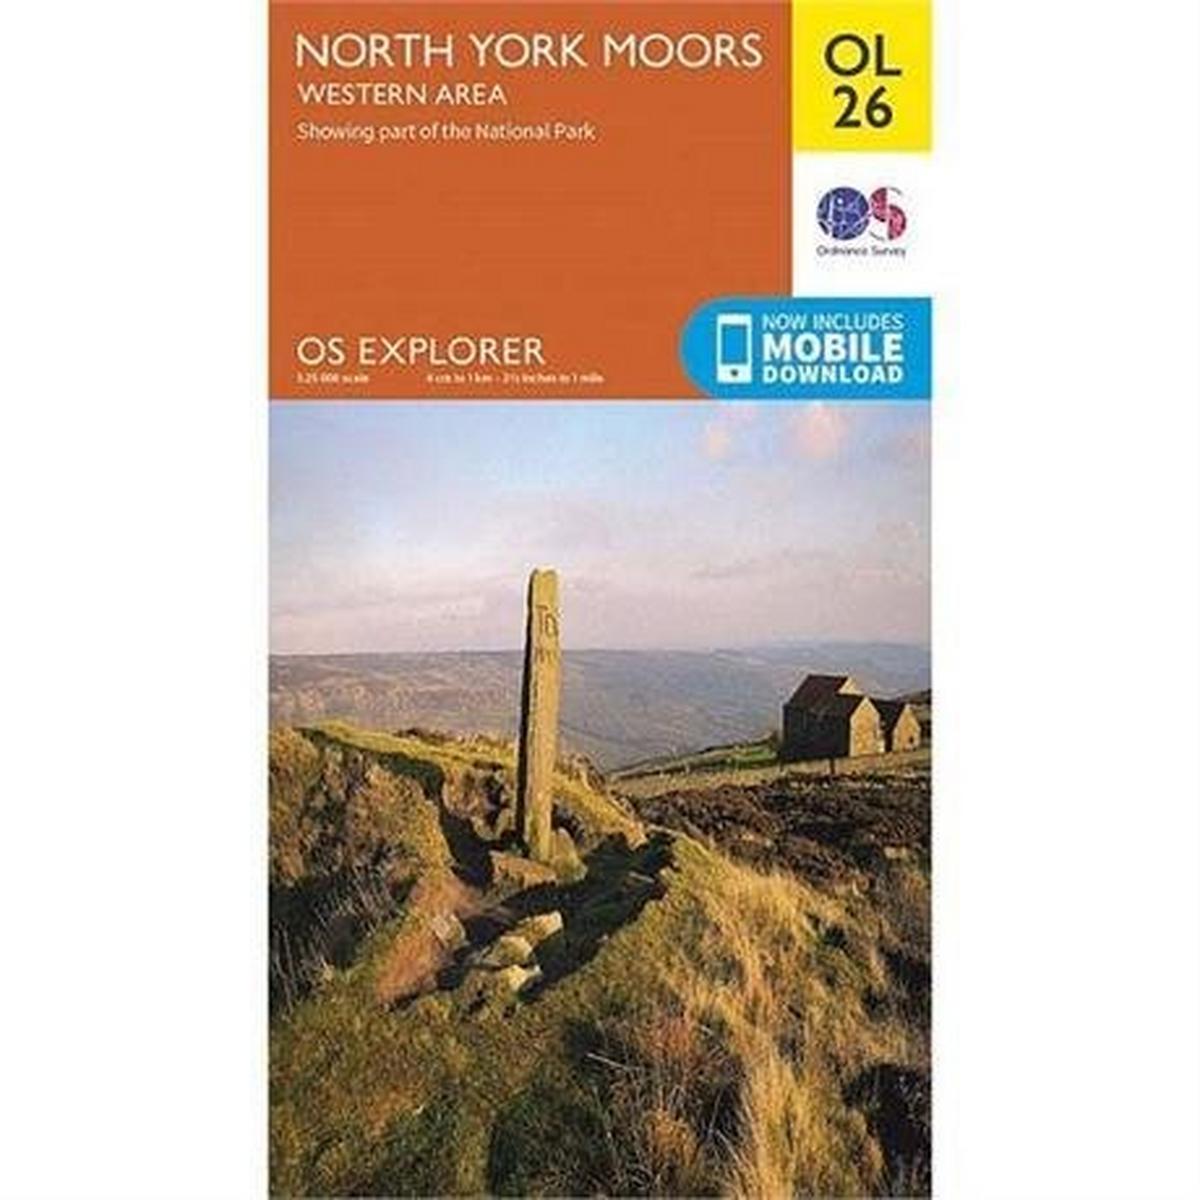 Ordnance Survey OS Explorer Map OL26 North York Moors - Western